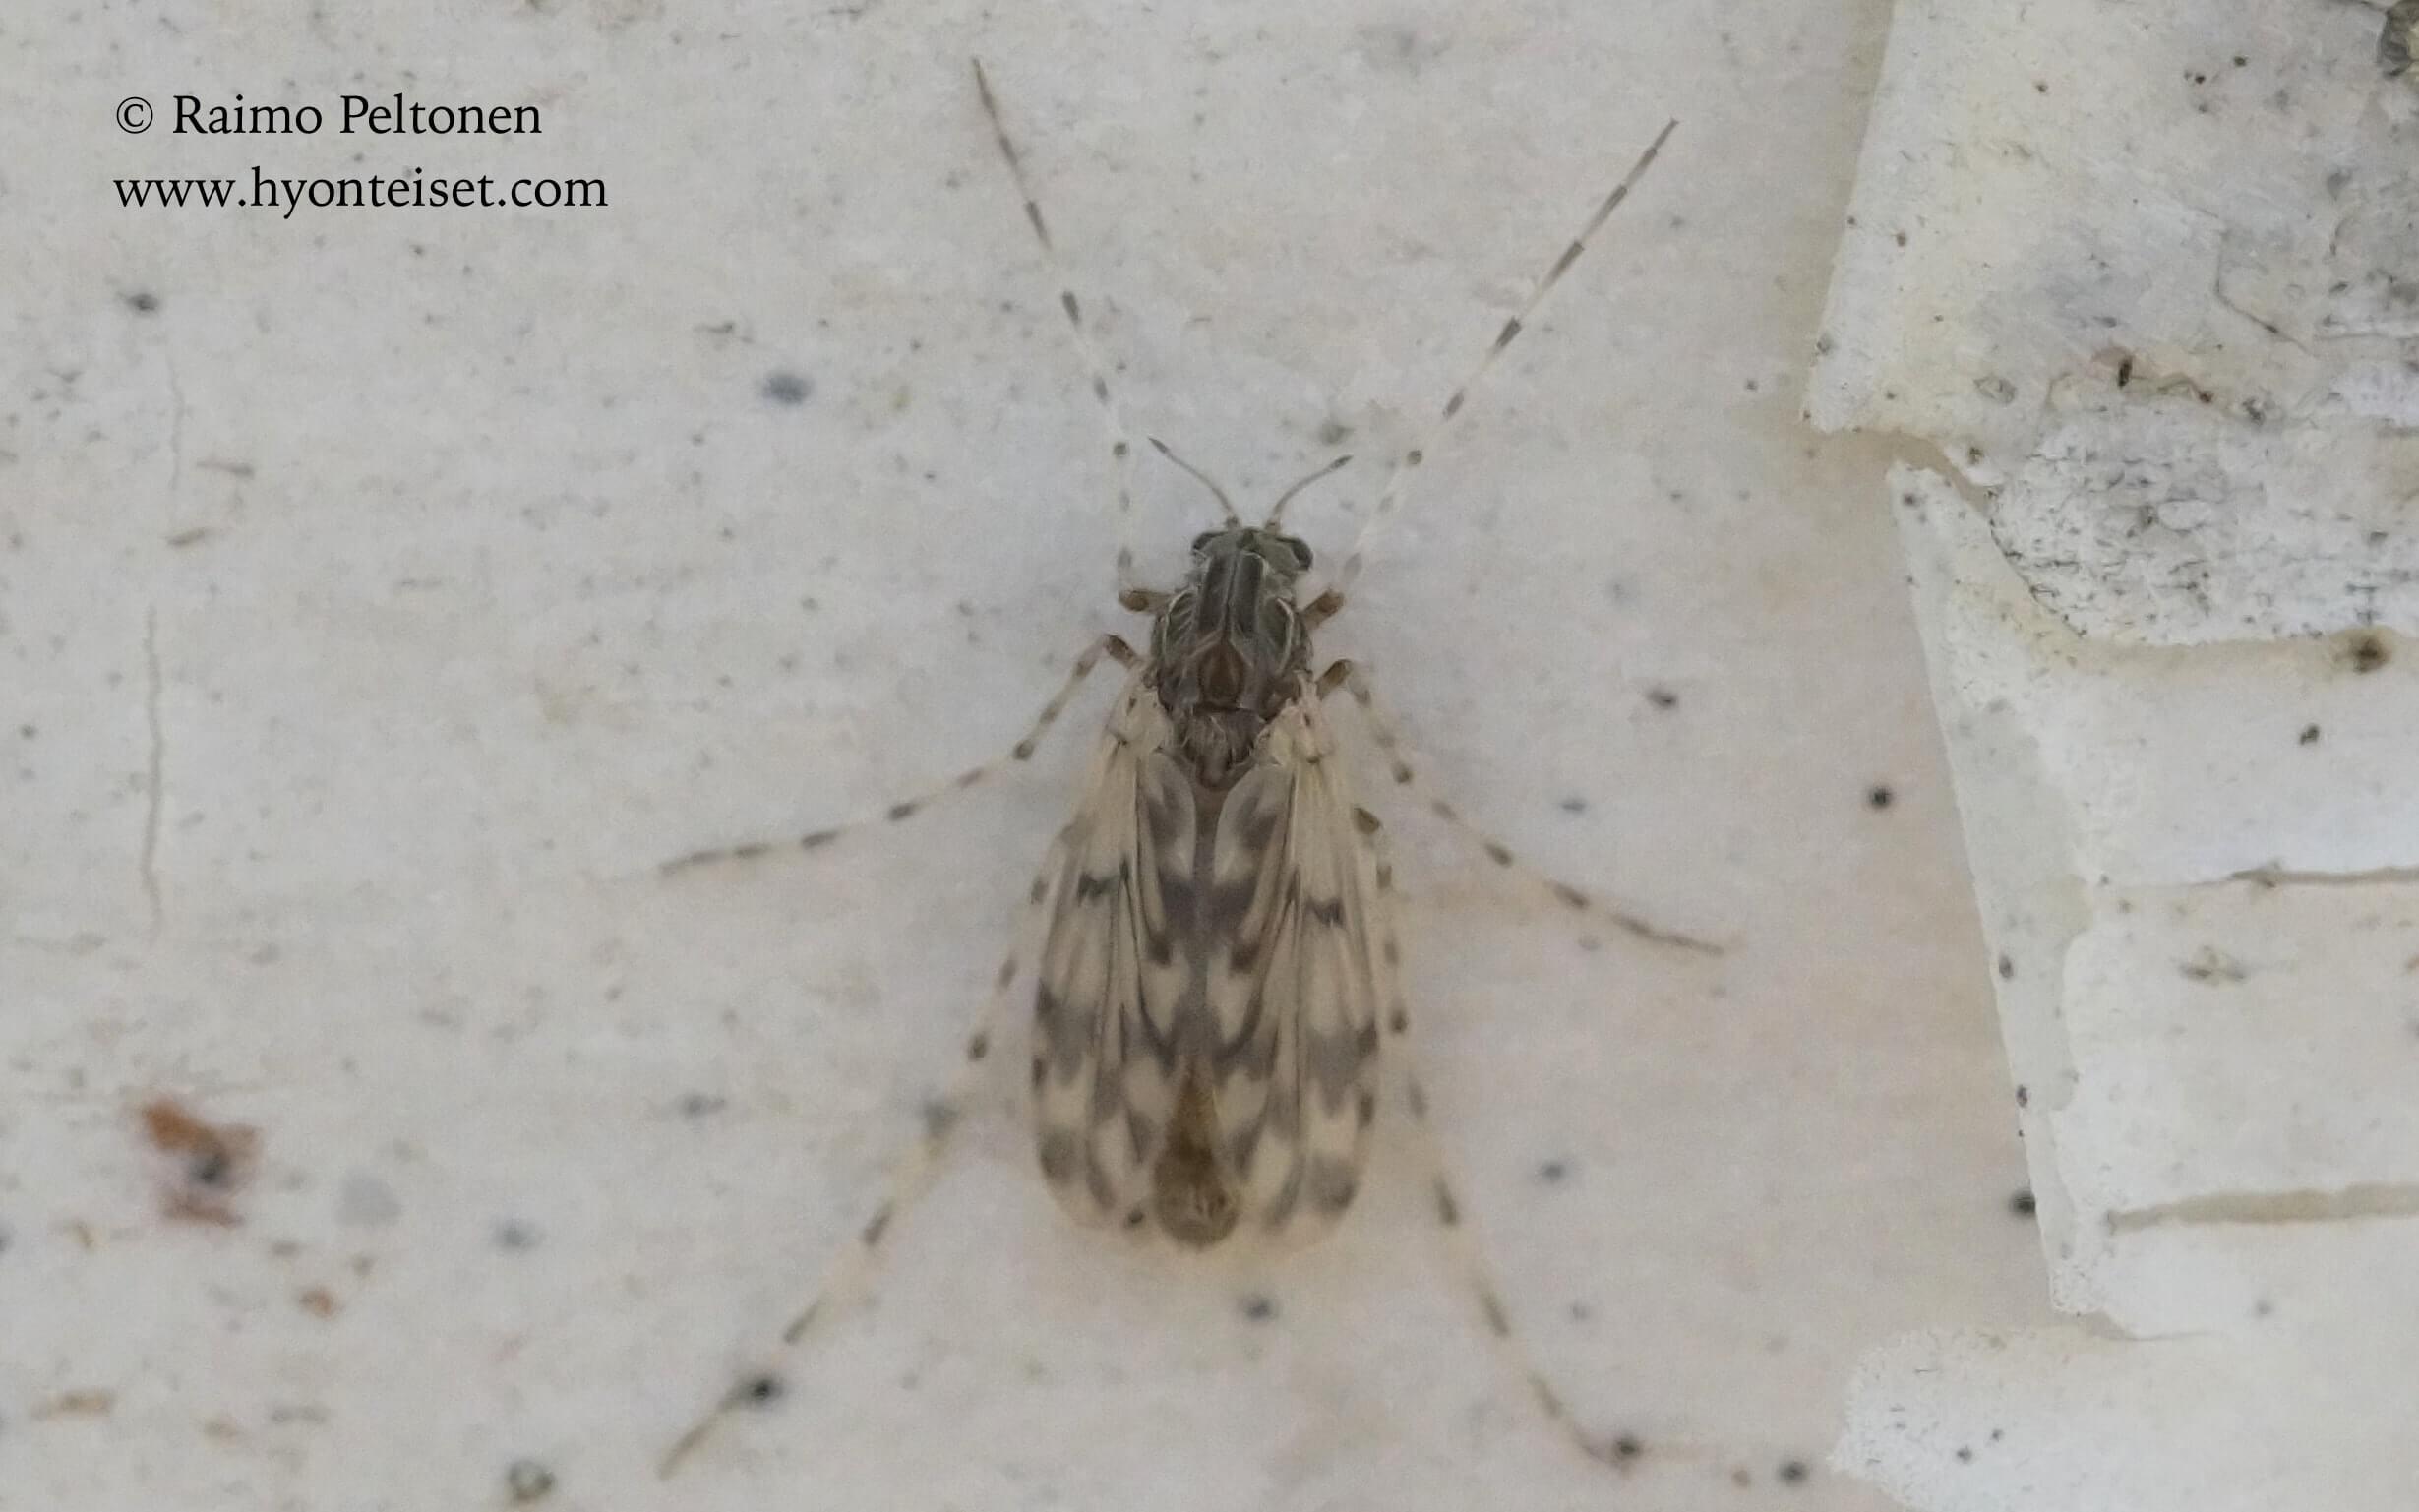 Ablabesmyia sp. (det. John Carr), 24.5.2017 Jyväskylä